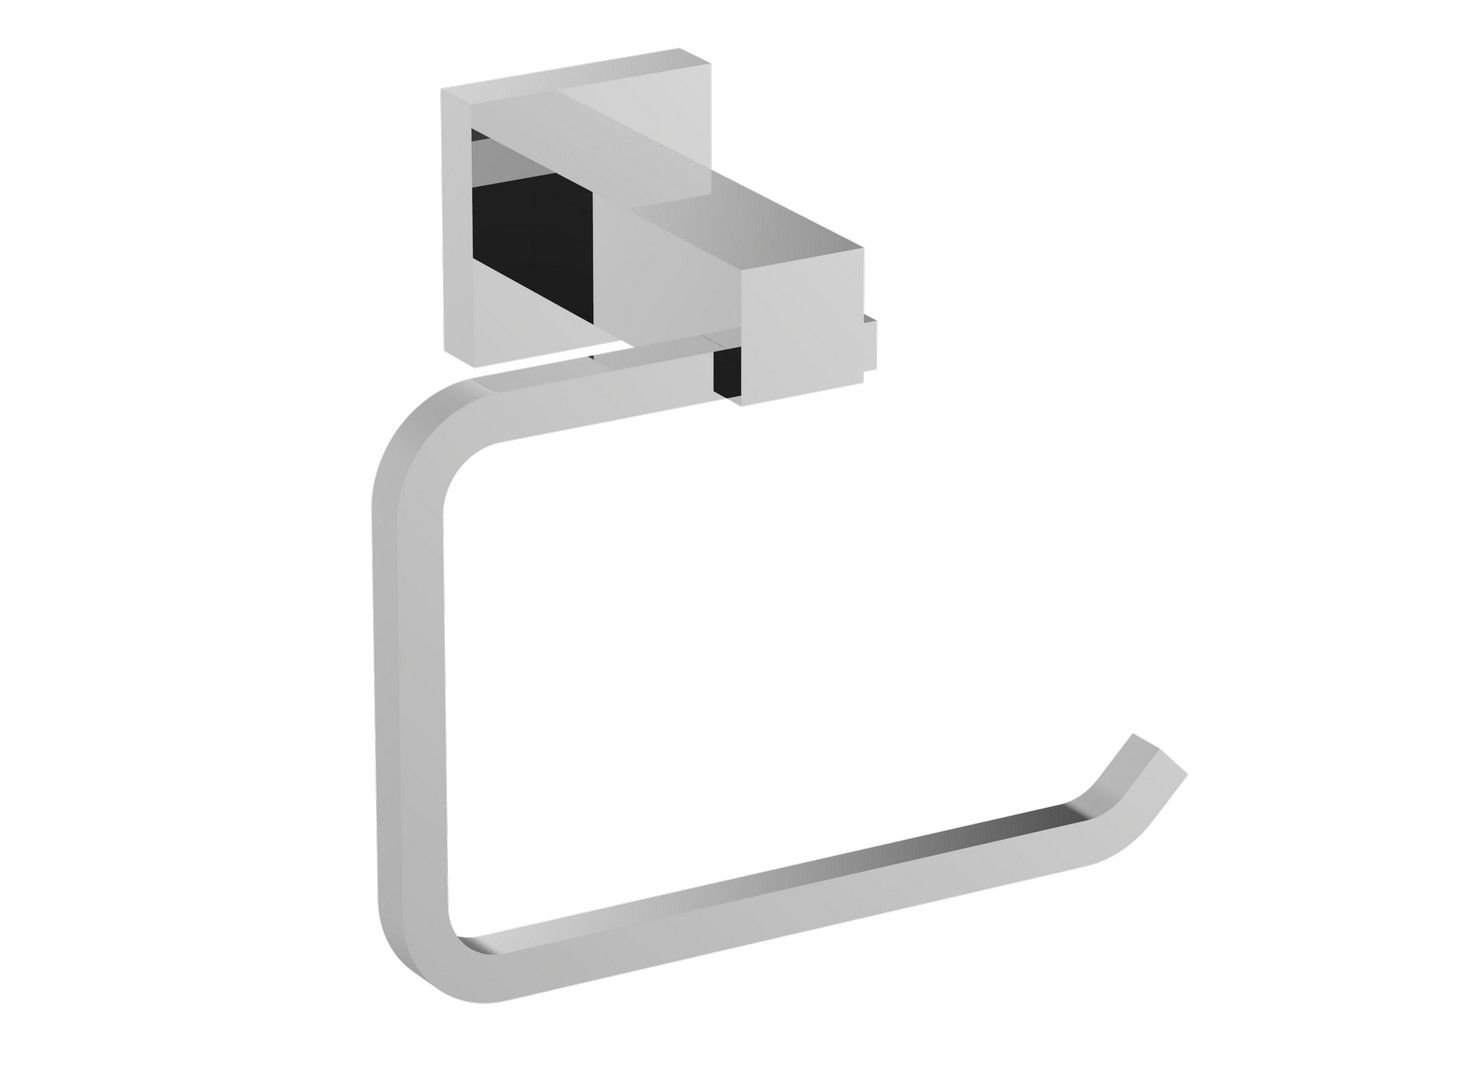 Eviva Square Holdy Toilet Paper Or Towel Holder Brushed Nickel Bathroom Accessories Bathroom Accessories Bathroom Accessories Chrome Brushed Nickel Bathroom Accessories